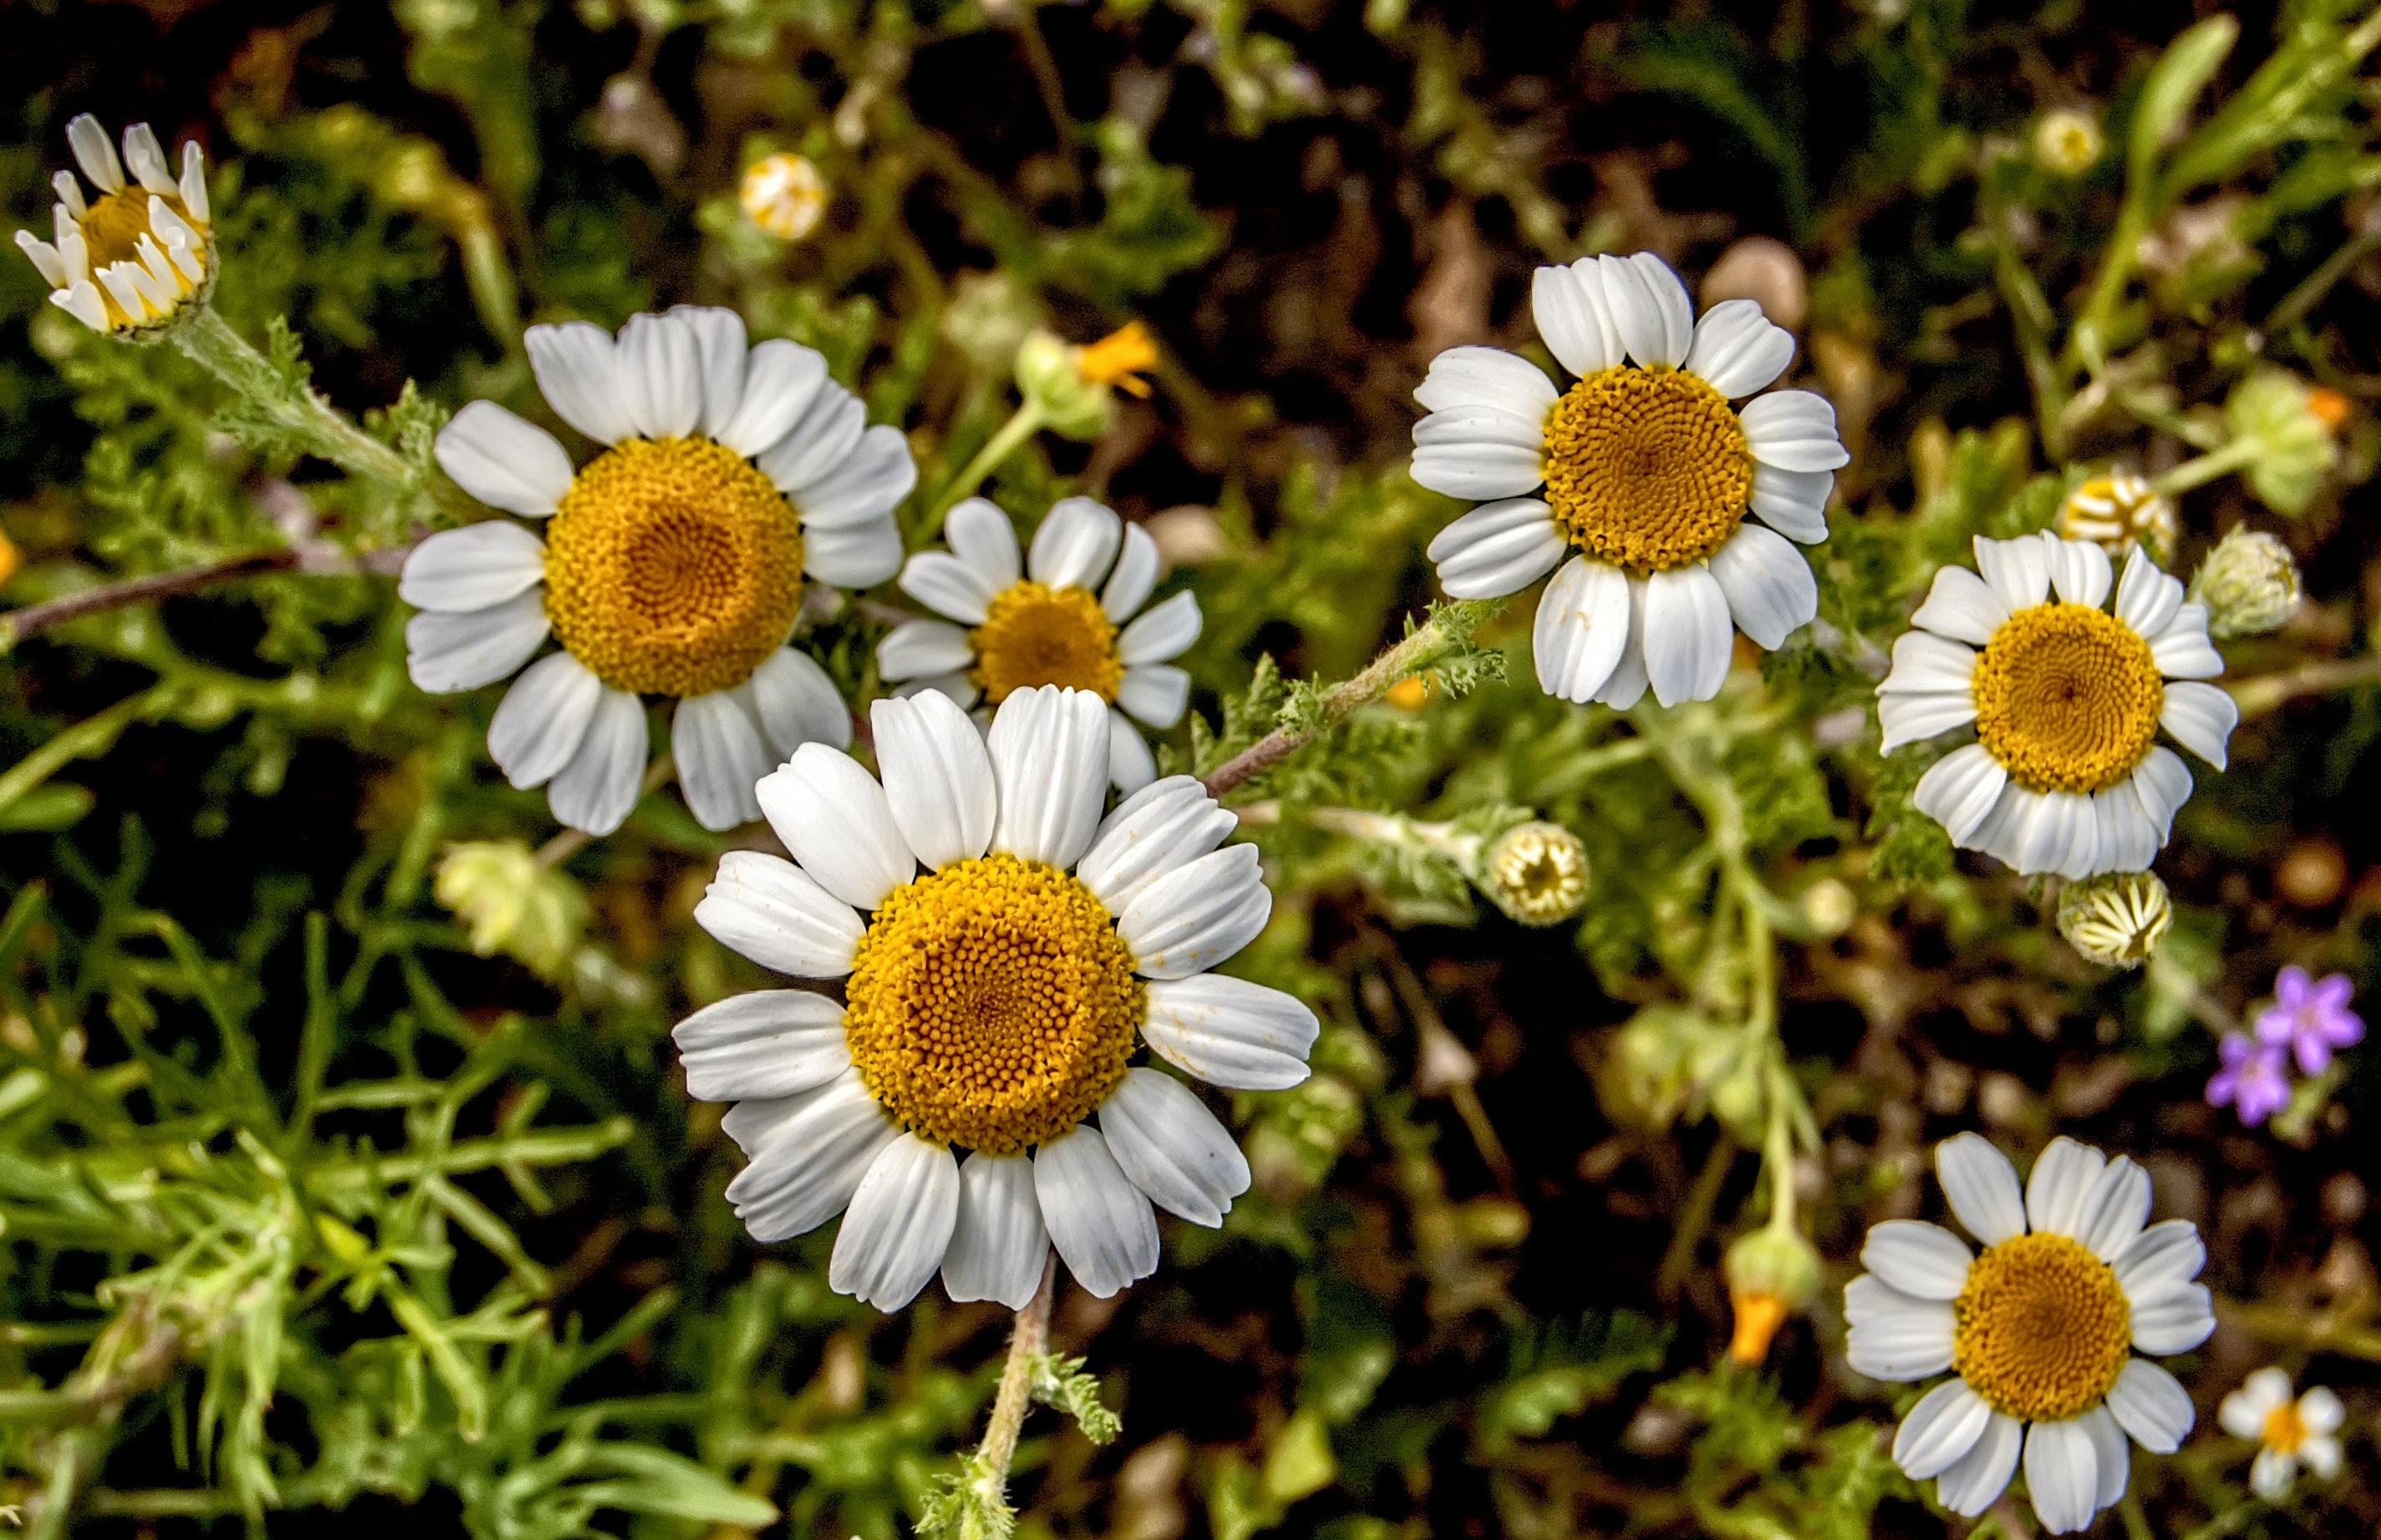 White And Yellow Daisy Flowers Free Stock Photo